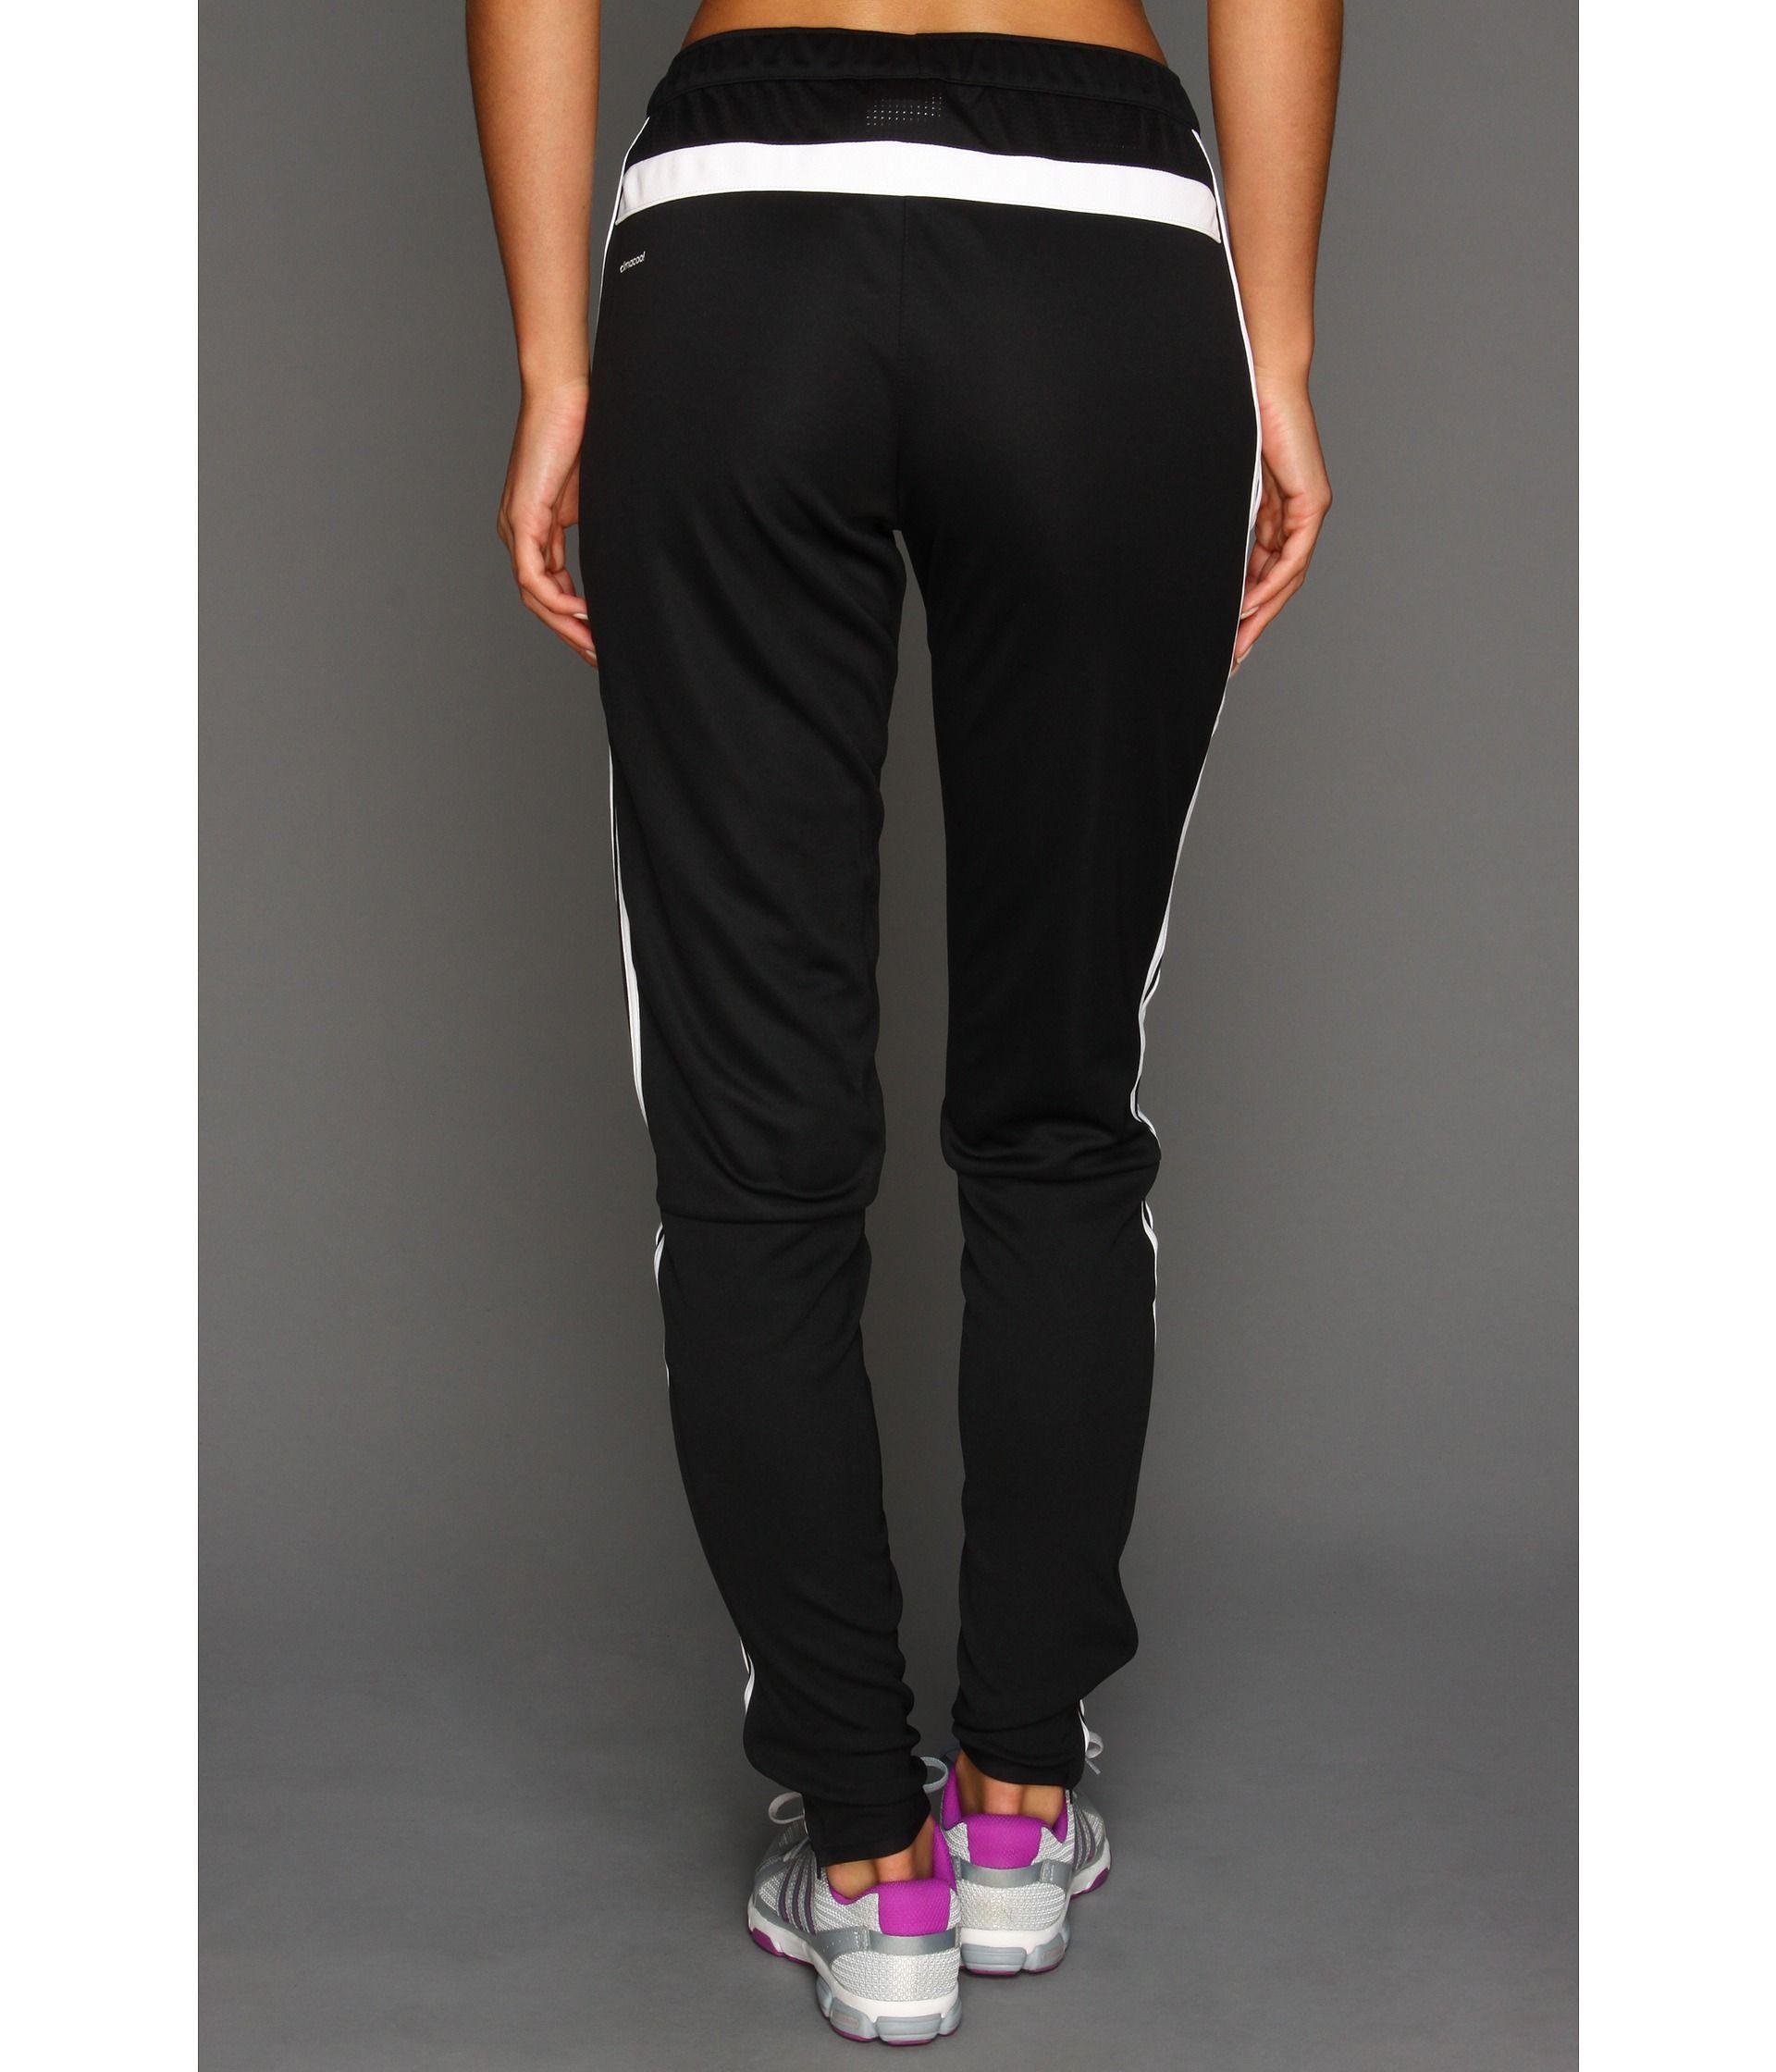 Adidas girl running Adidas pants women, Soccer